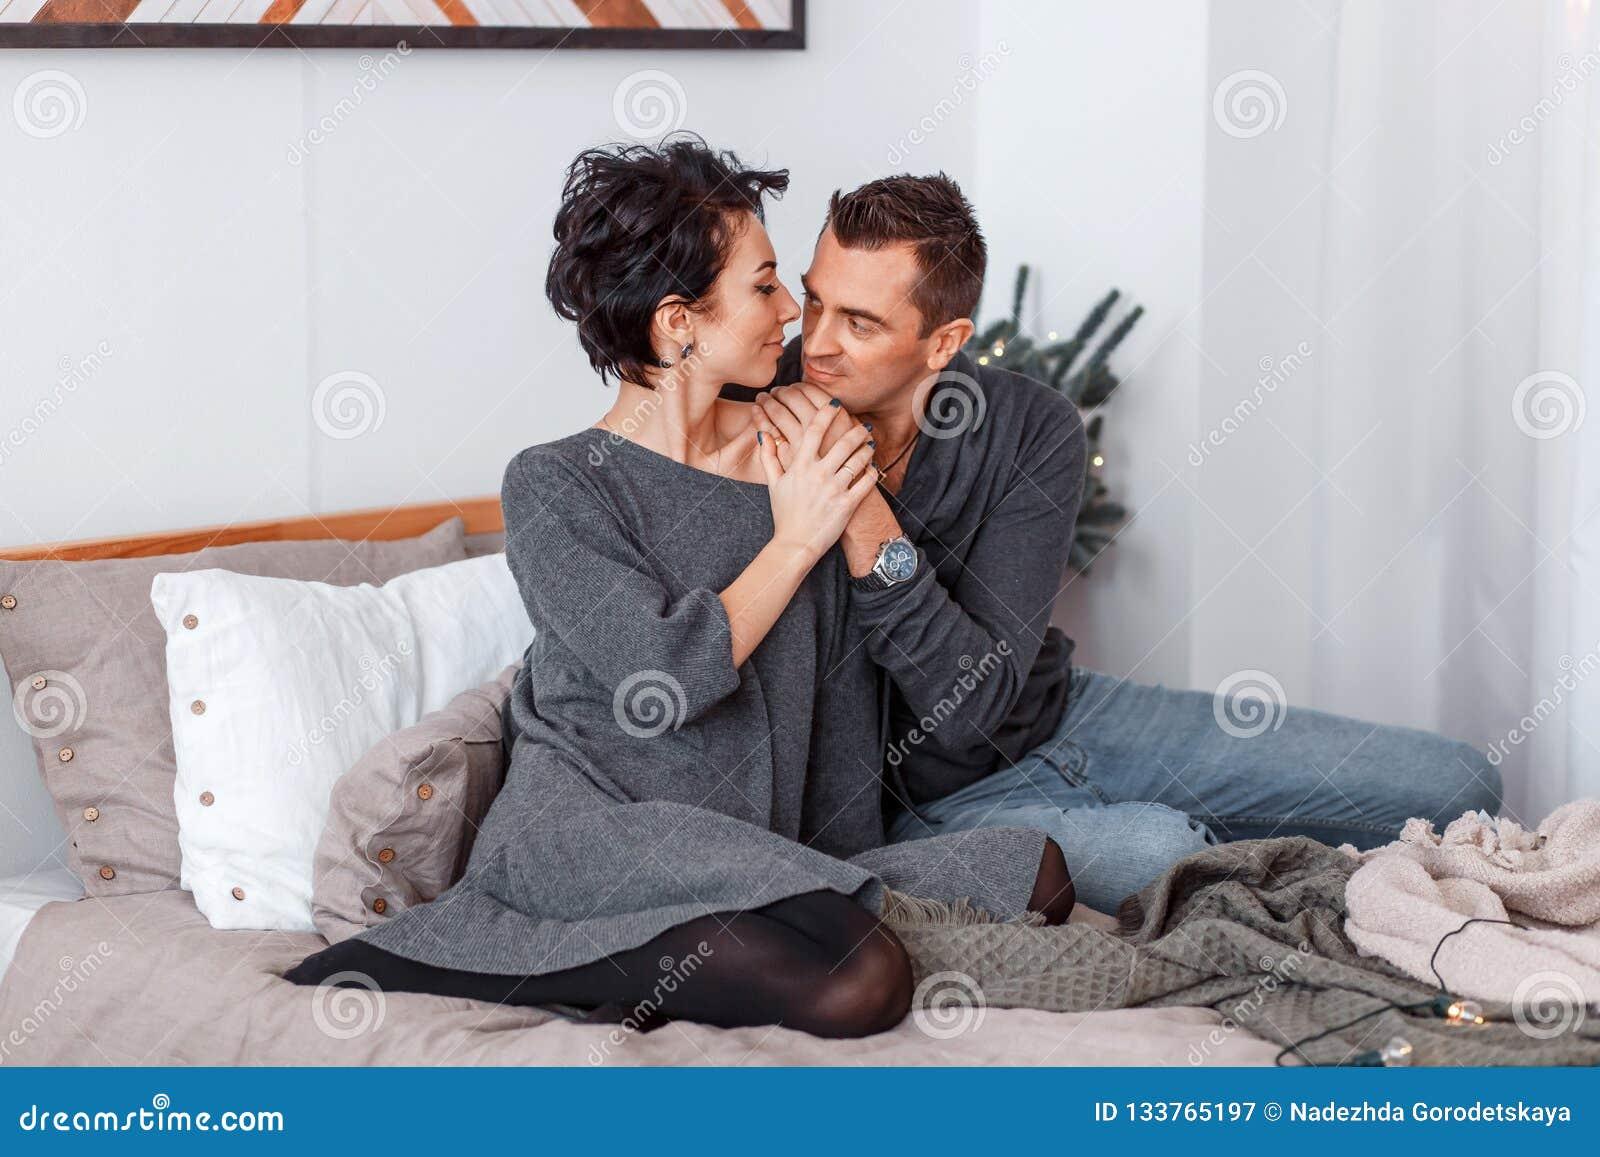 why men cuddle